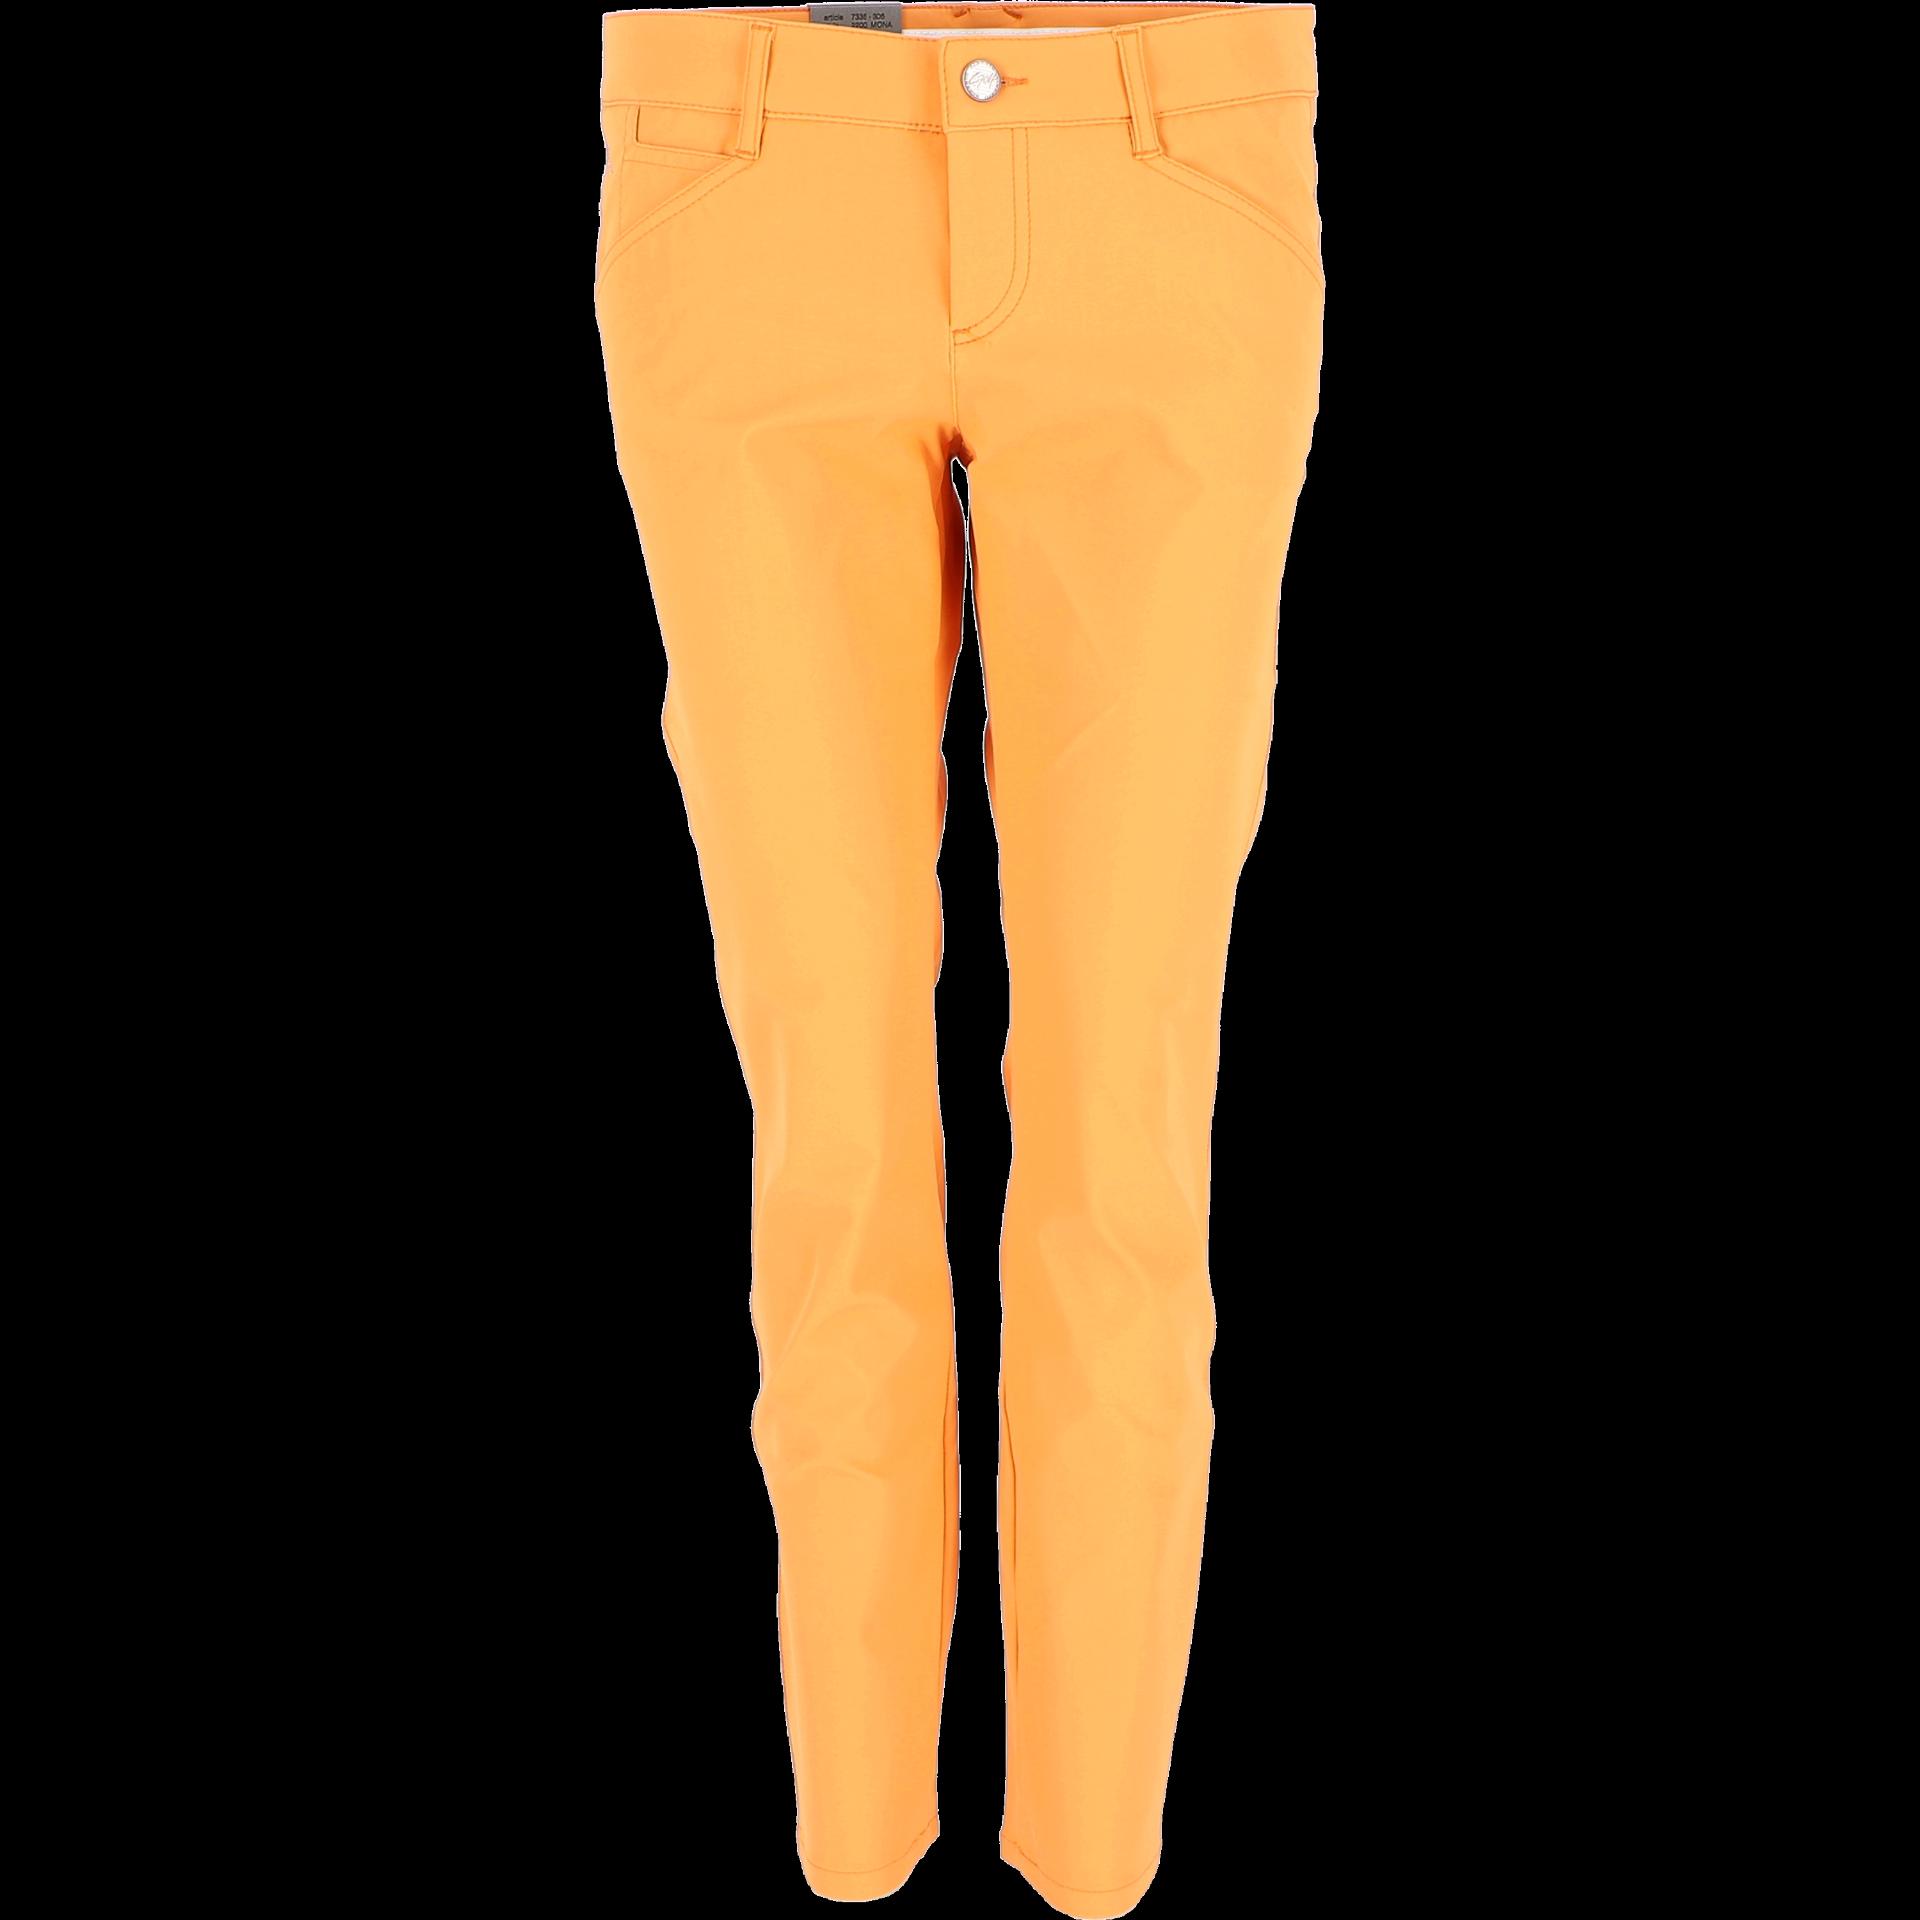 MONA Hose - 3xDRY Cooler, orange